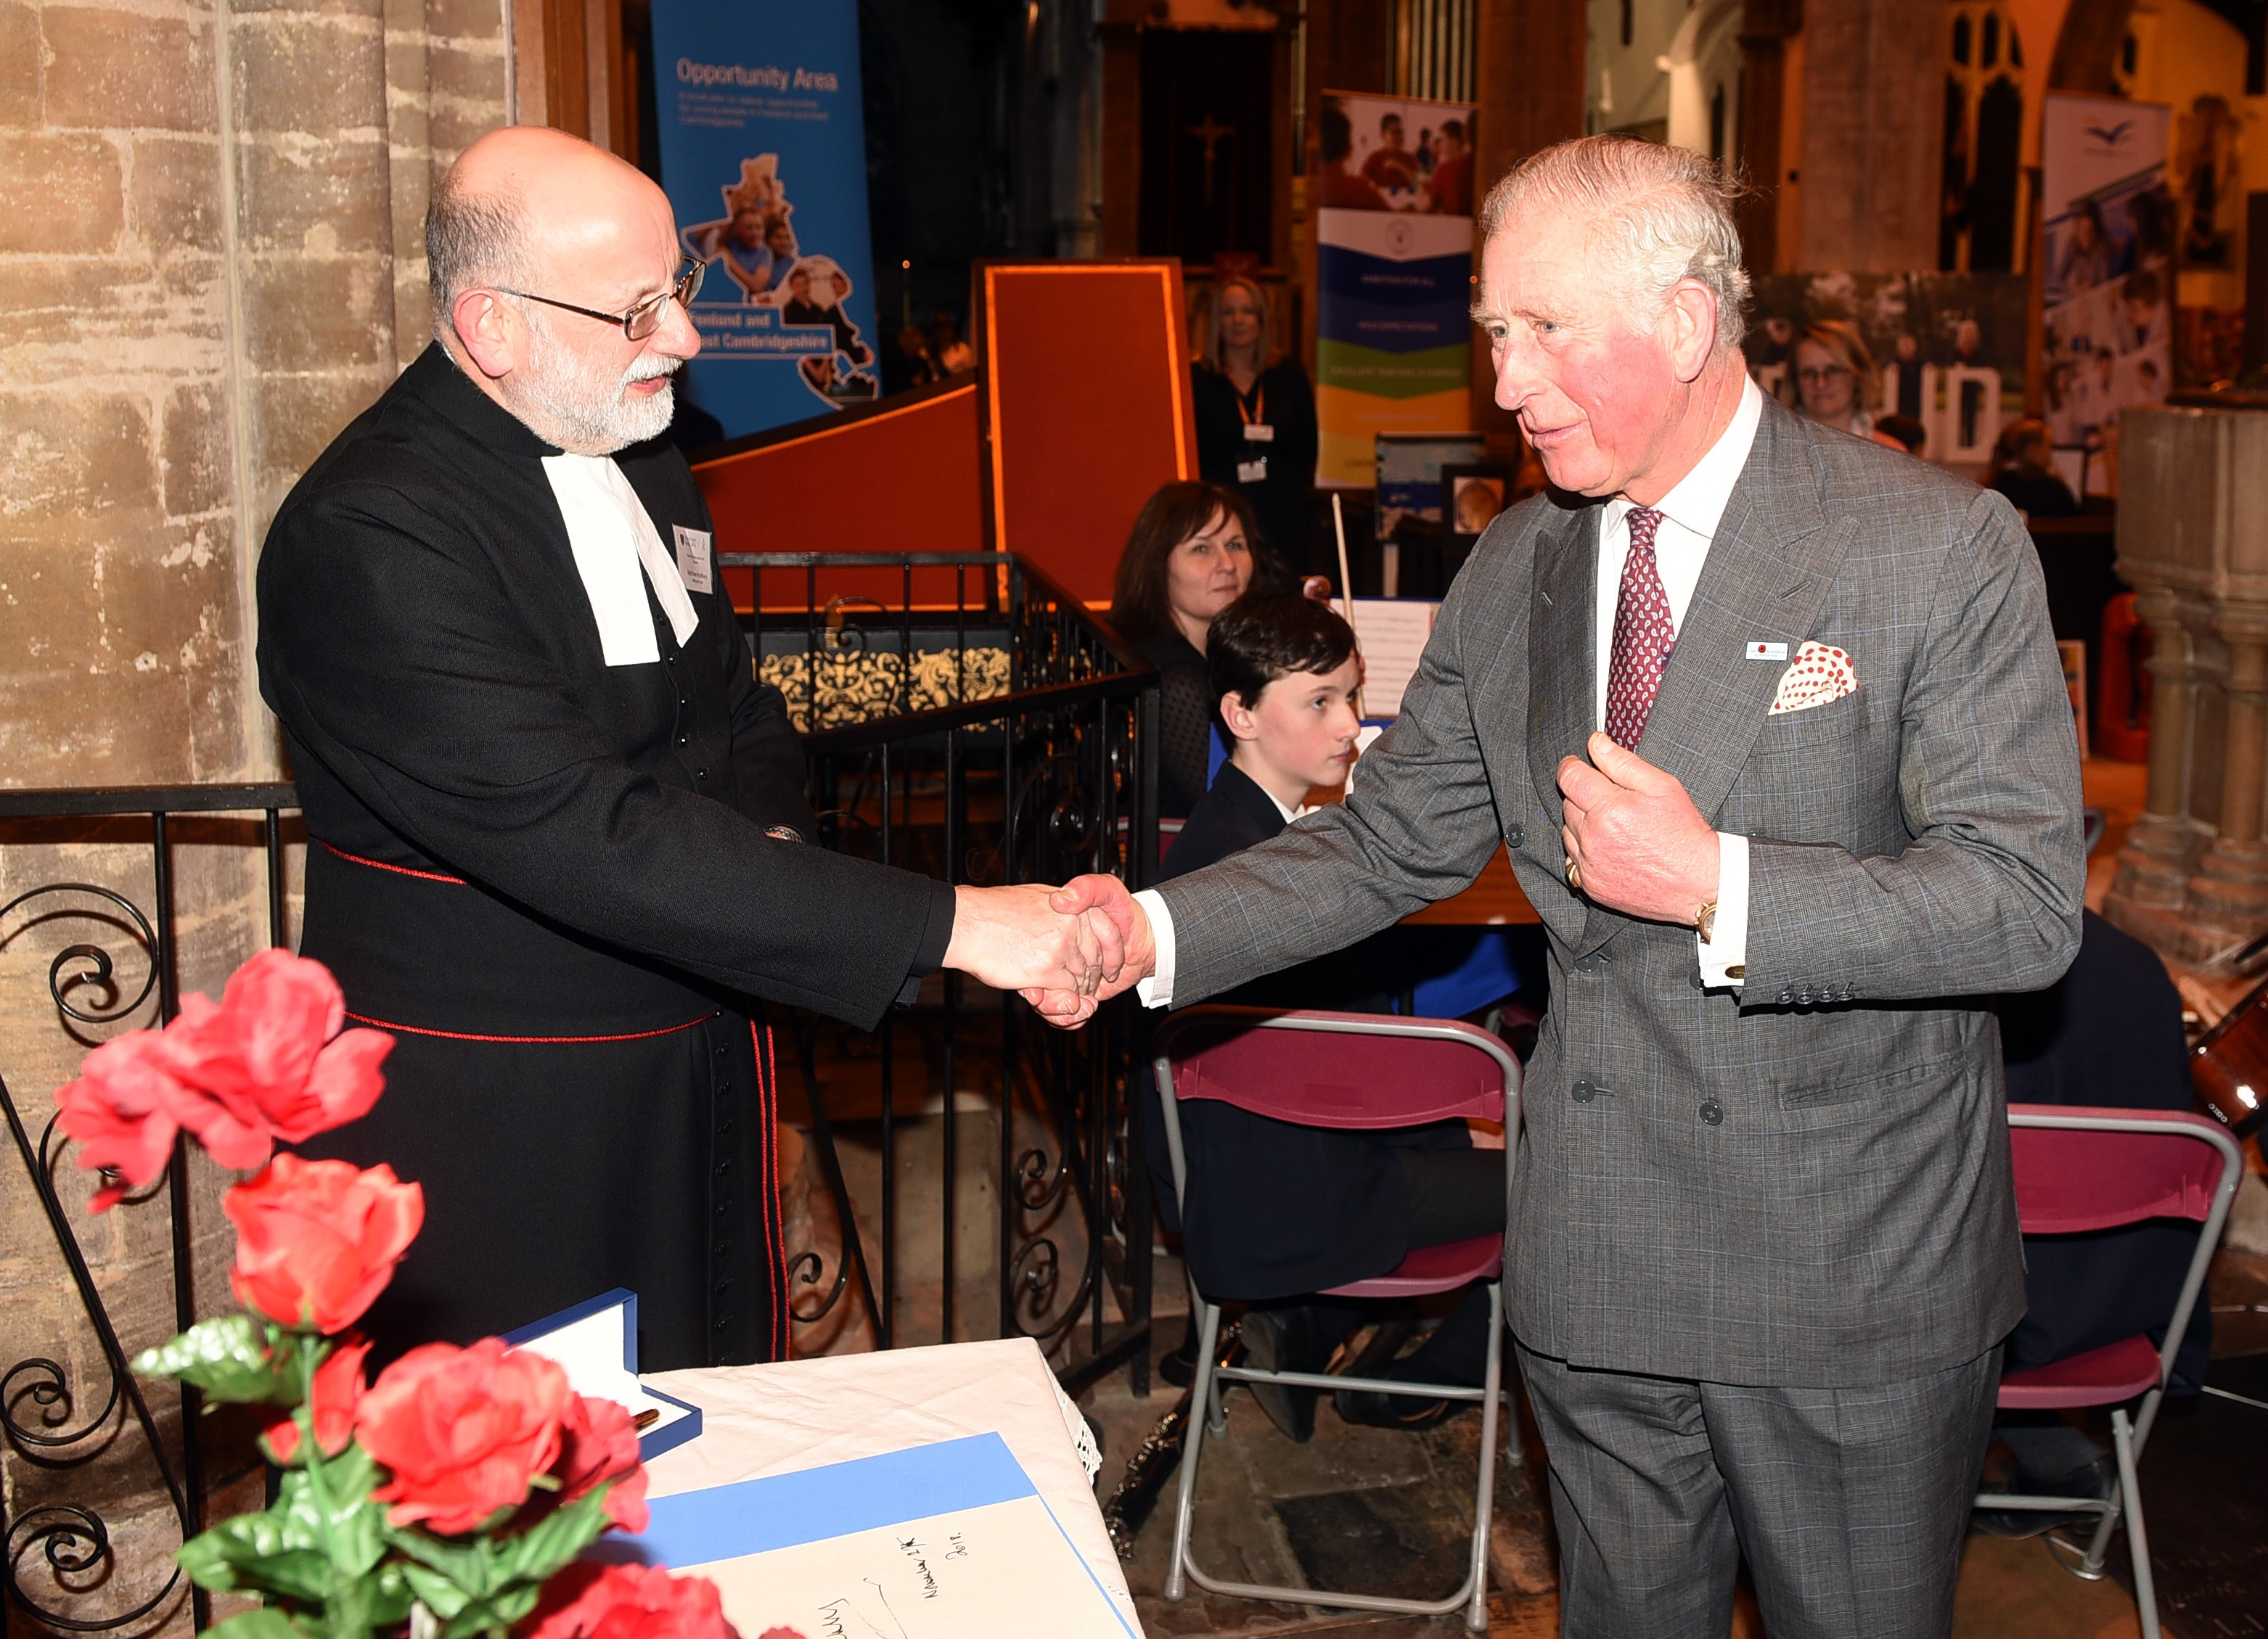 HRH Prince Charles with Rev Canon Matthew Bradbury (Click to enlarge)